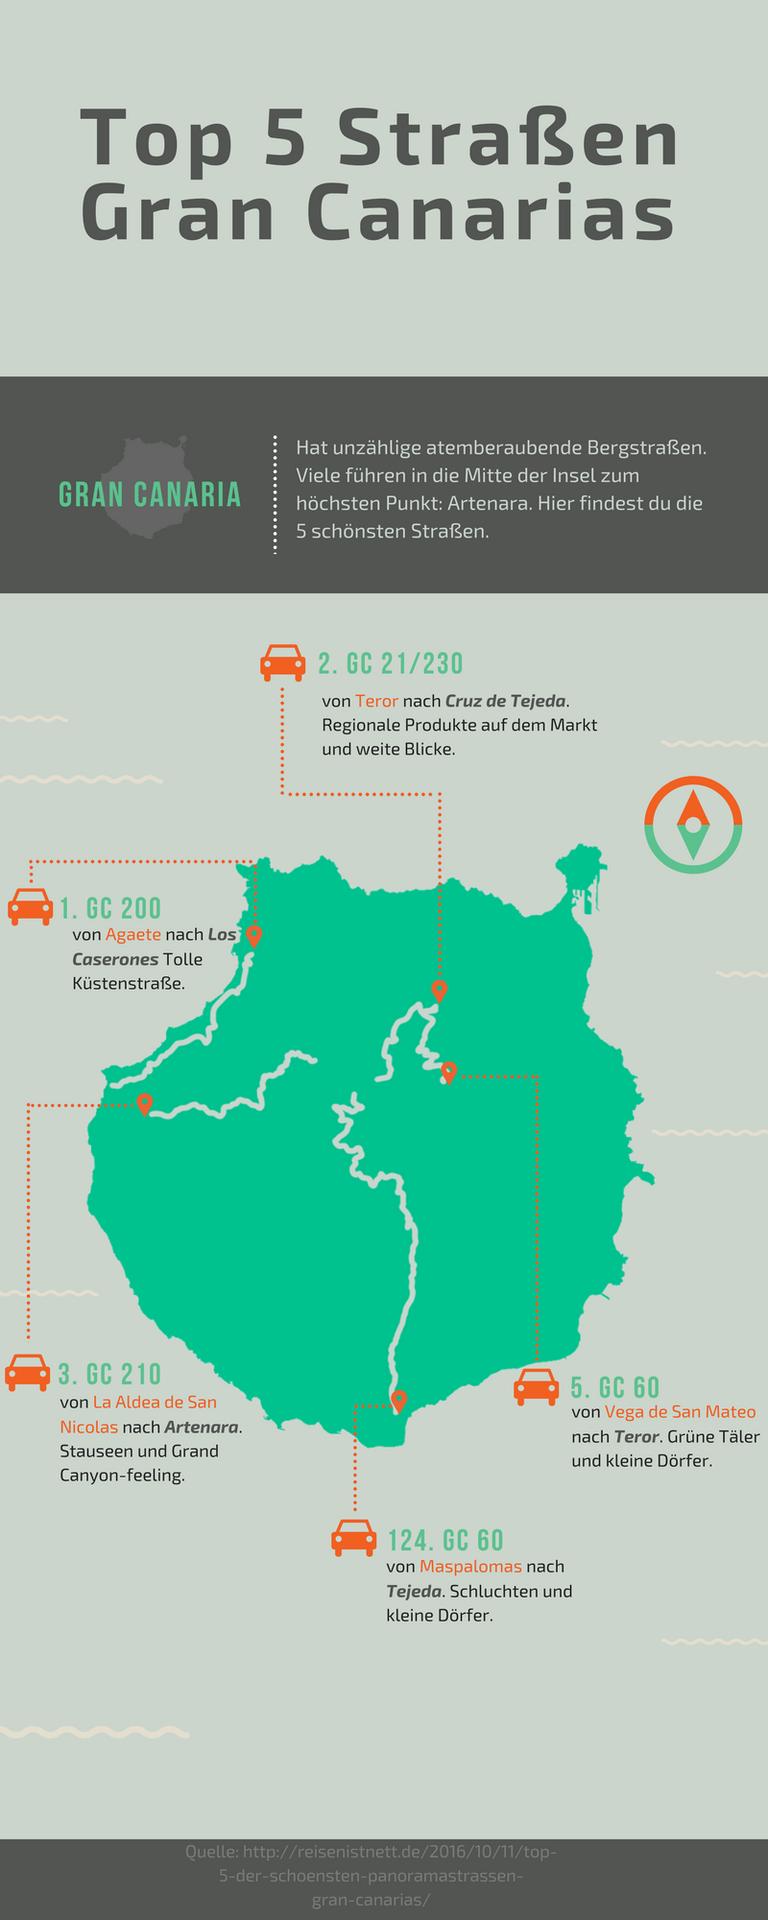 Grafik Top 5 Straßen Gran Canarias | CANARY ISLANDS | Pinterest ...